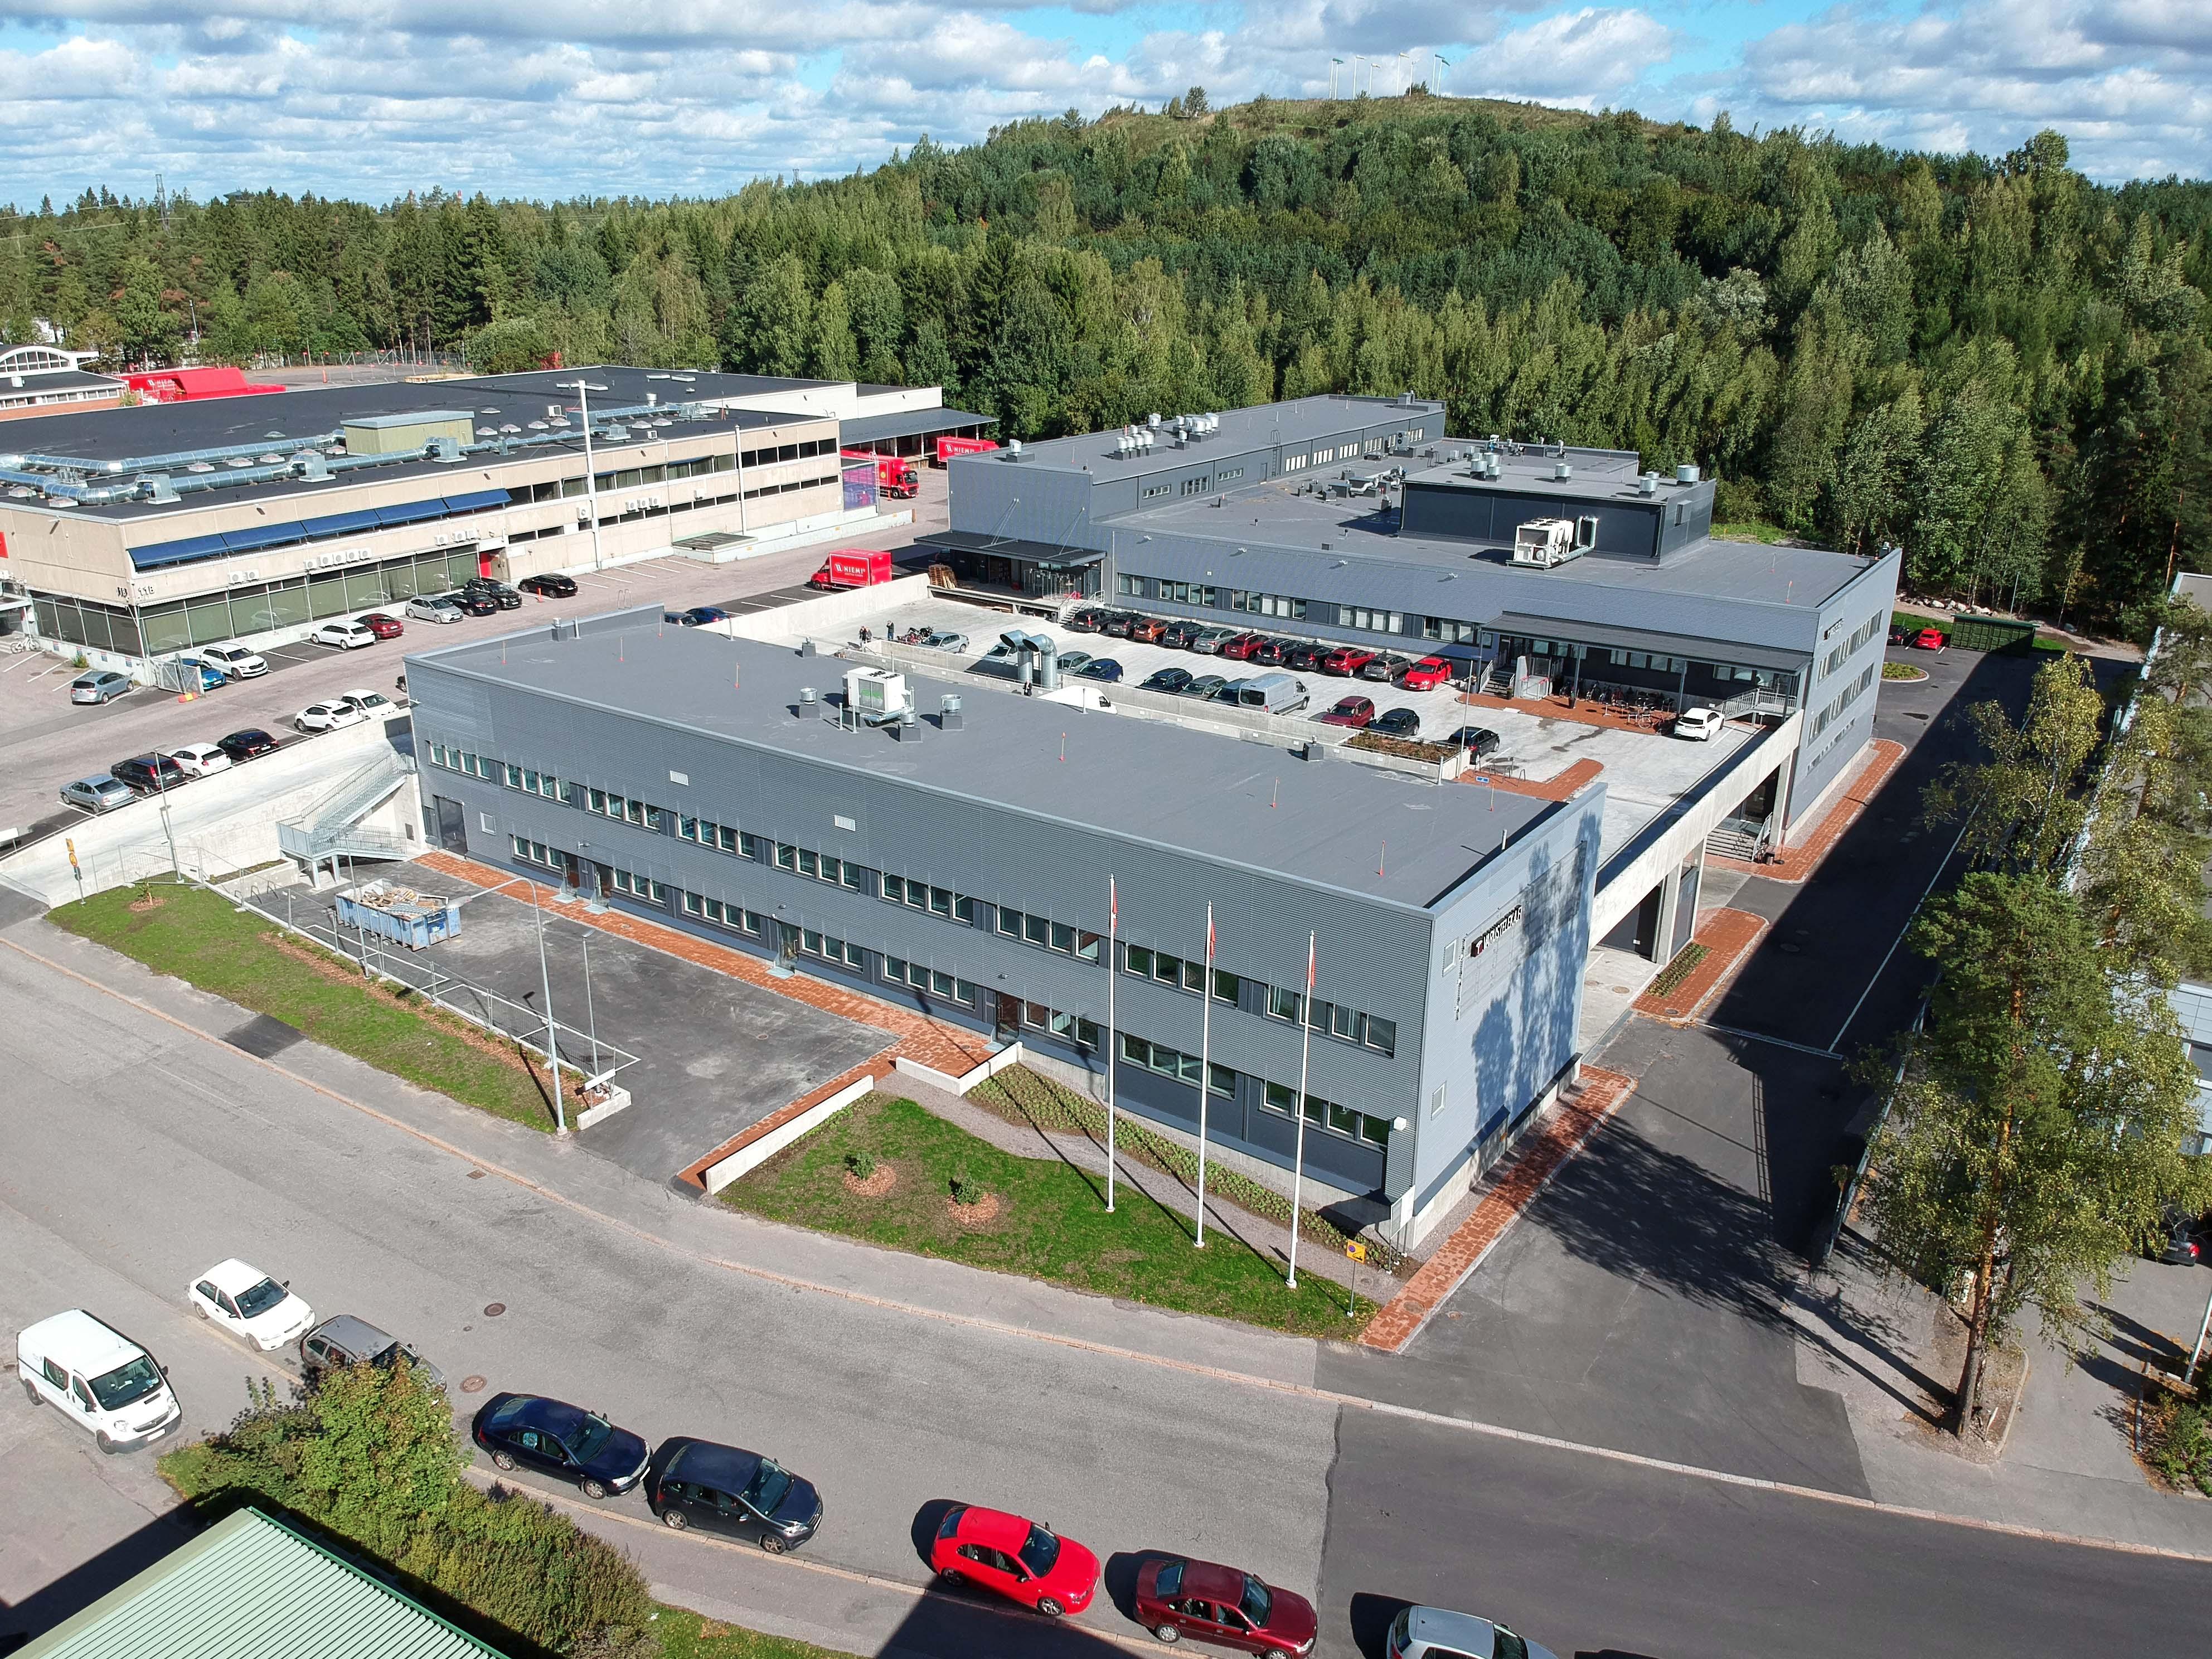 Toimitila, Hankasuontie 11, Konala, Helsinki